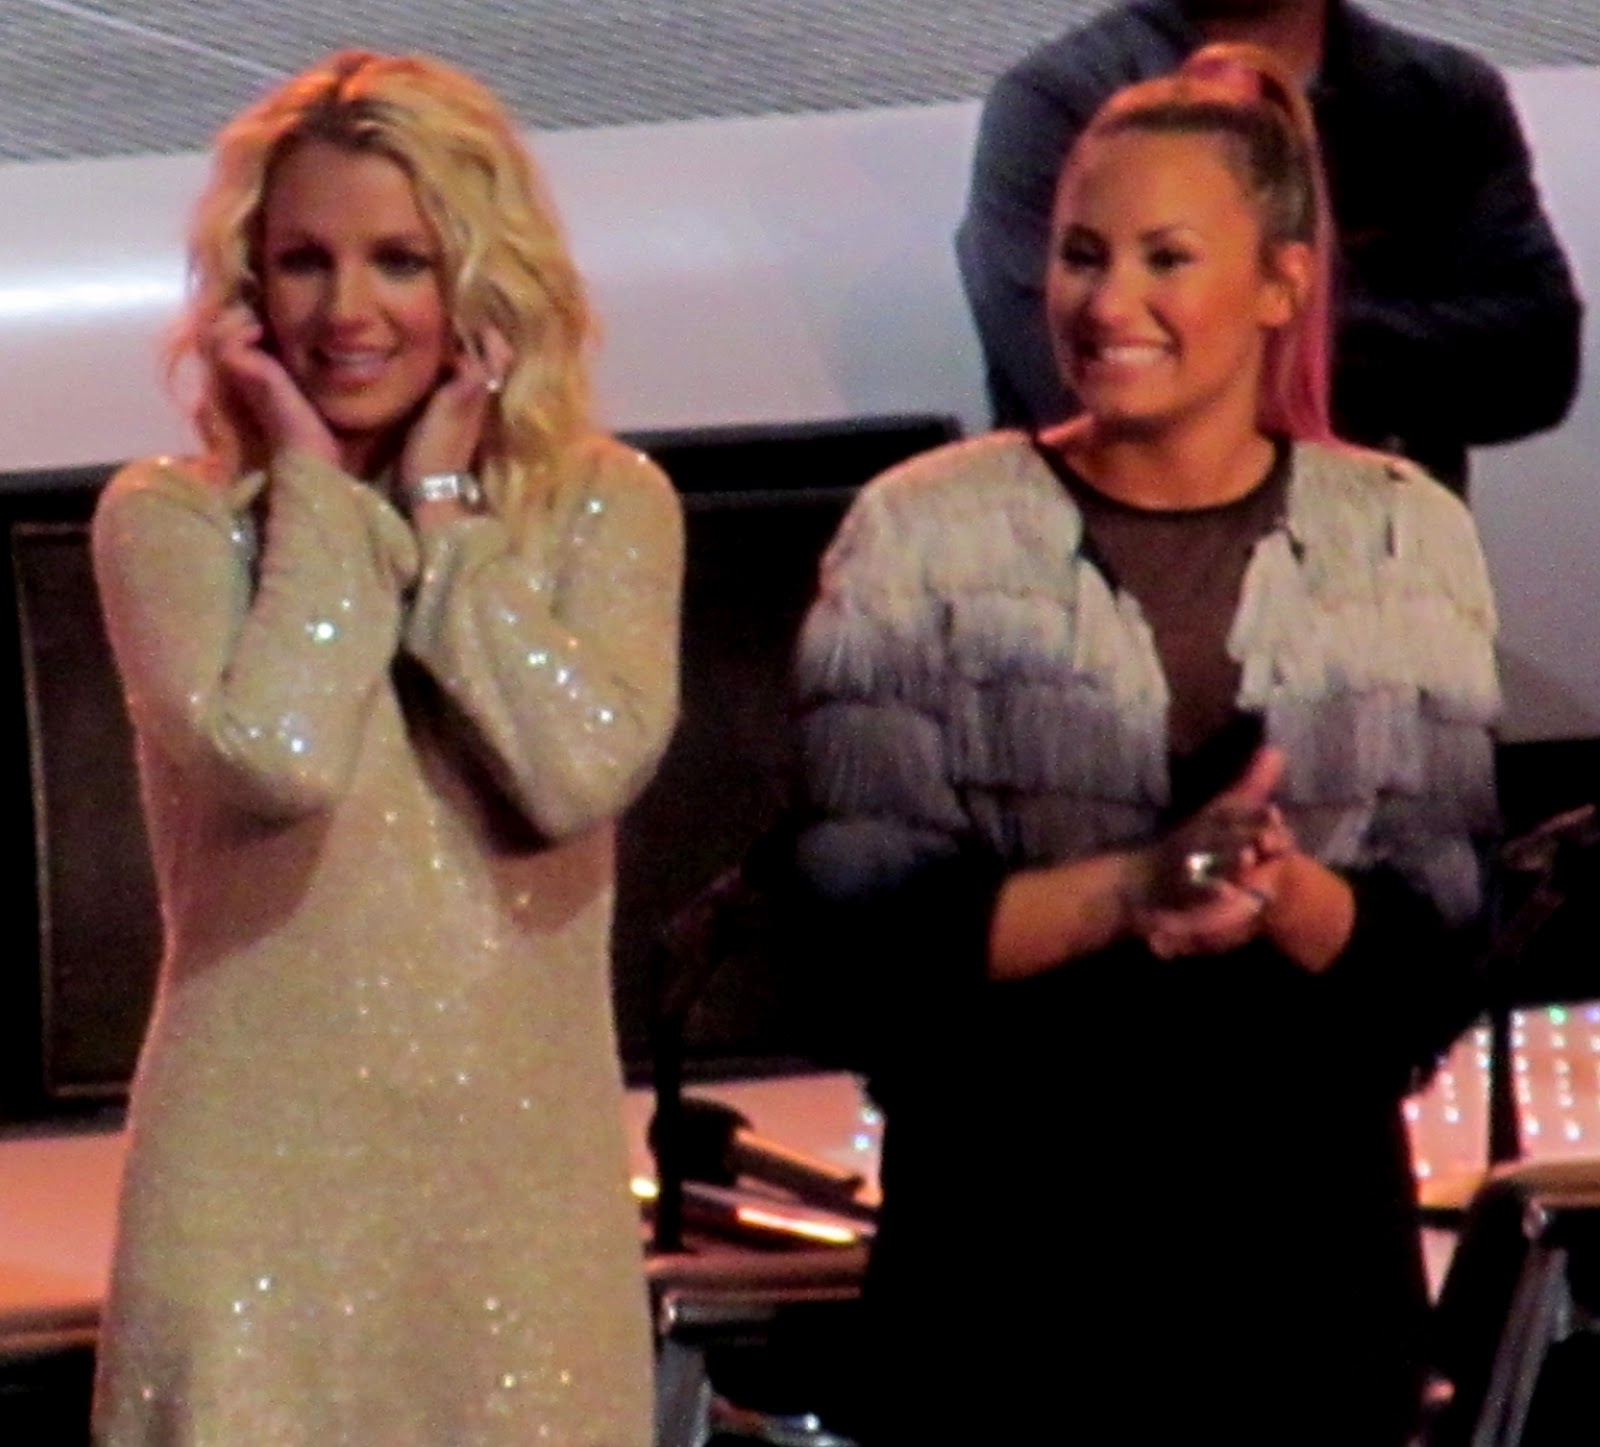 http://2.bp.blogspot.com/-aYoht68DMto/UO1V7ybc5JI/AAAAAAAAFgI/DDCqULCGAao/s1600/Britney_Spears,_Demi_Lovato_X-Factor_2,_2012.jpg